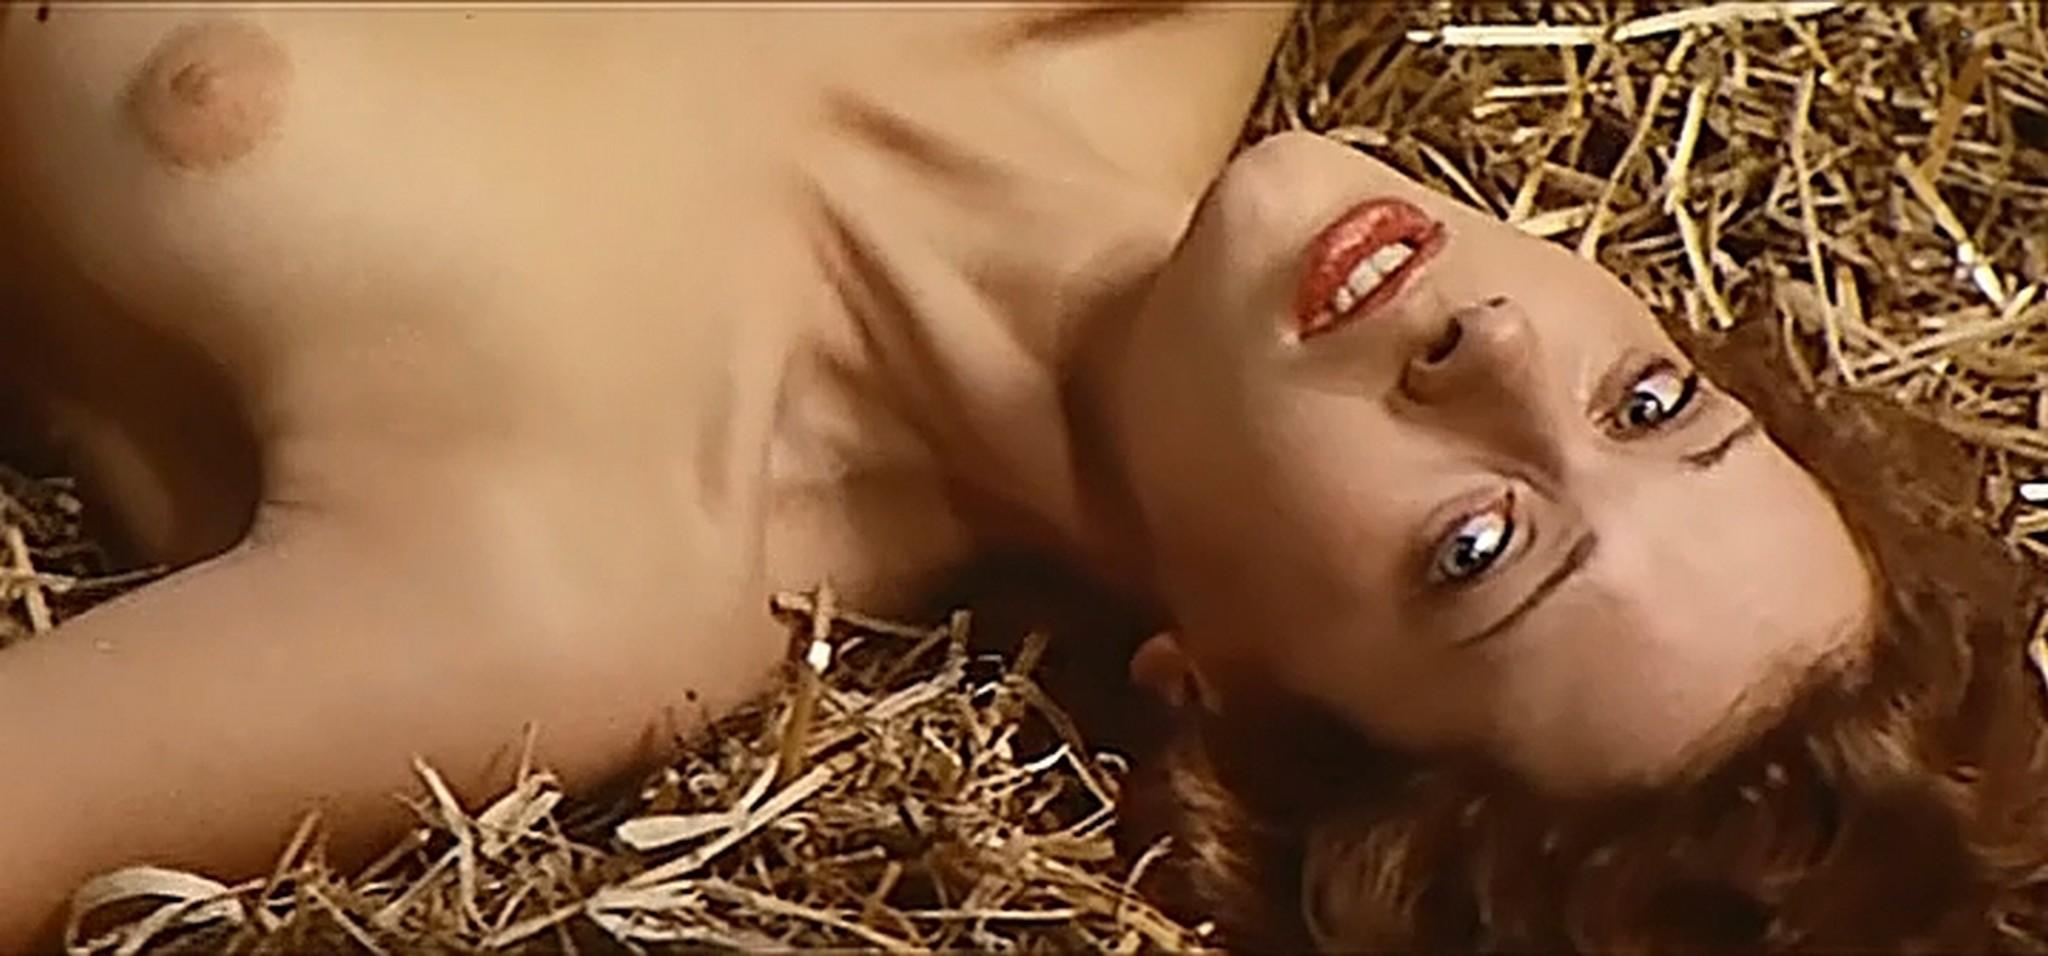 Anicee Alvina nude full frontal Sylvia Kristel and others nude Le jeu avec le feu FR 1975 DVDrip 14